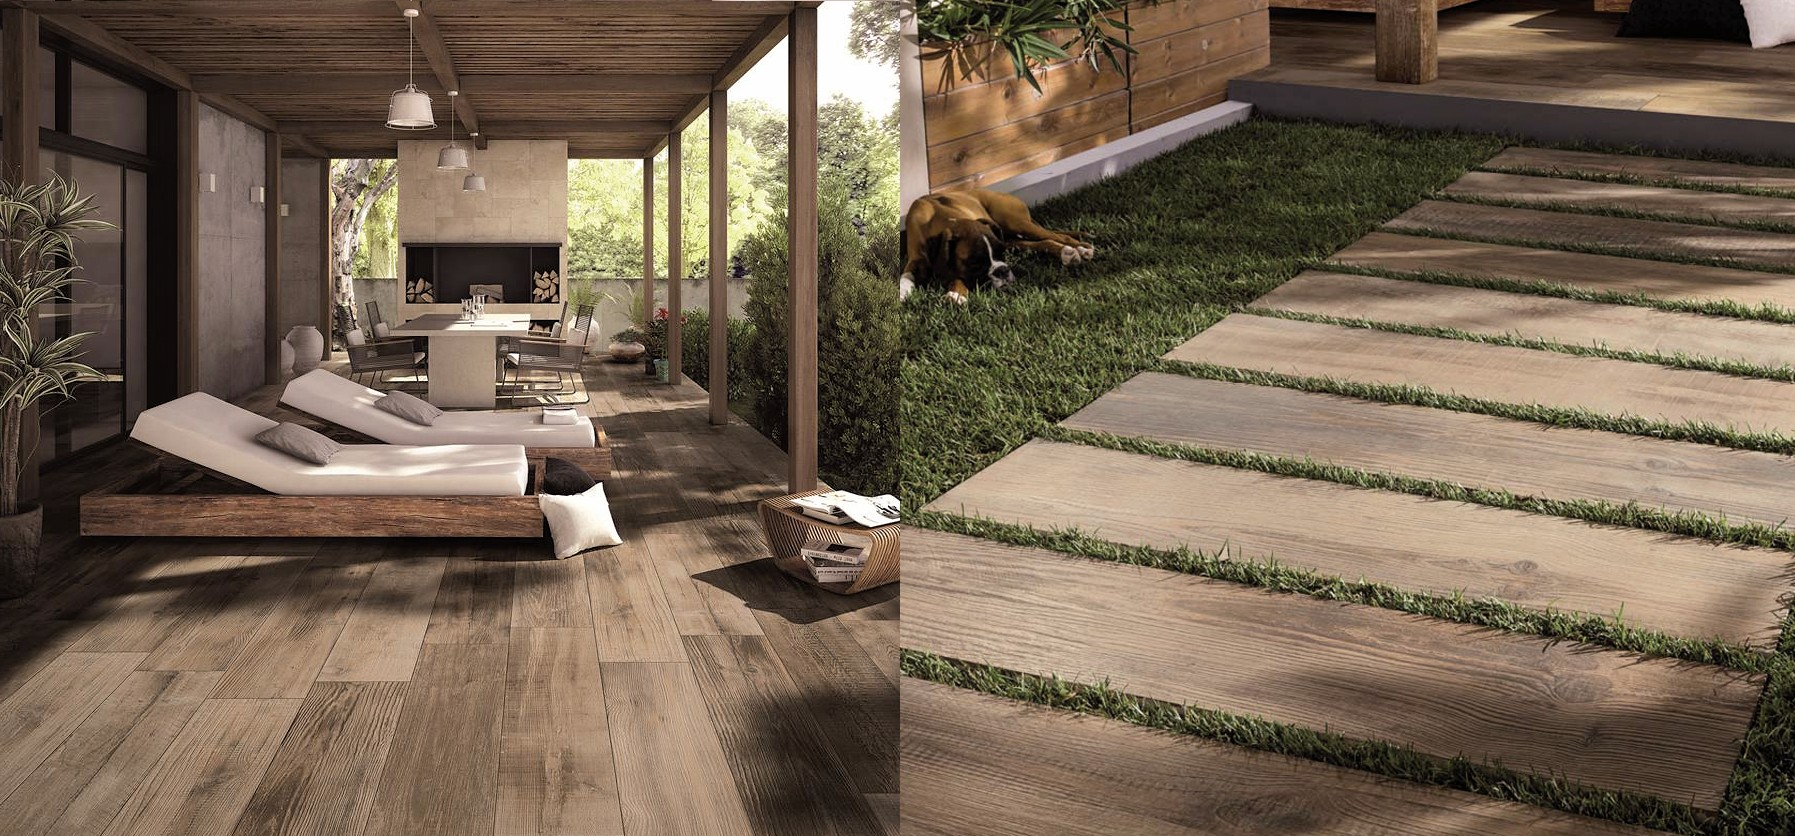 fliesen f r drau en fkh. Black Bedroom Furniture Sets. Home Design Ideas